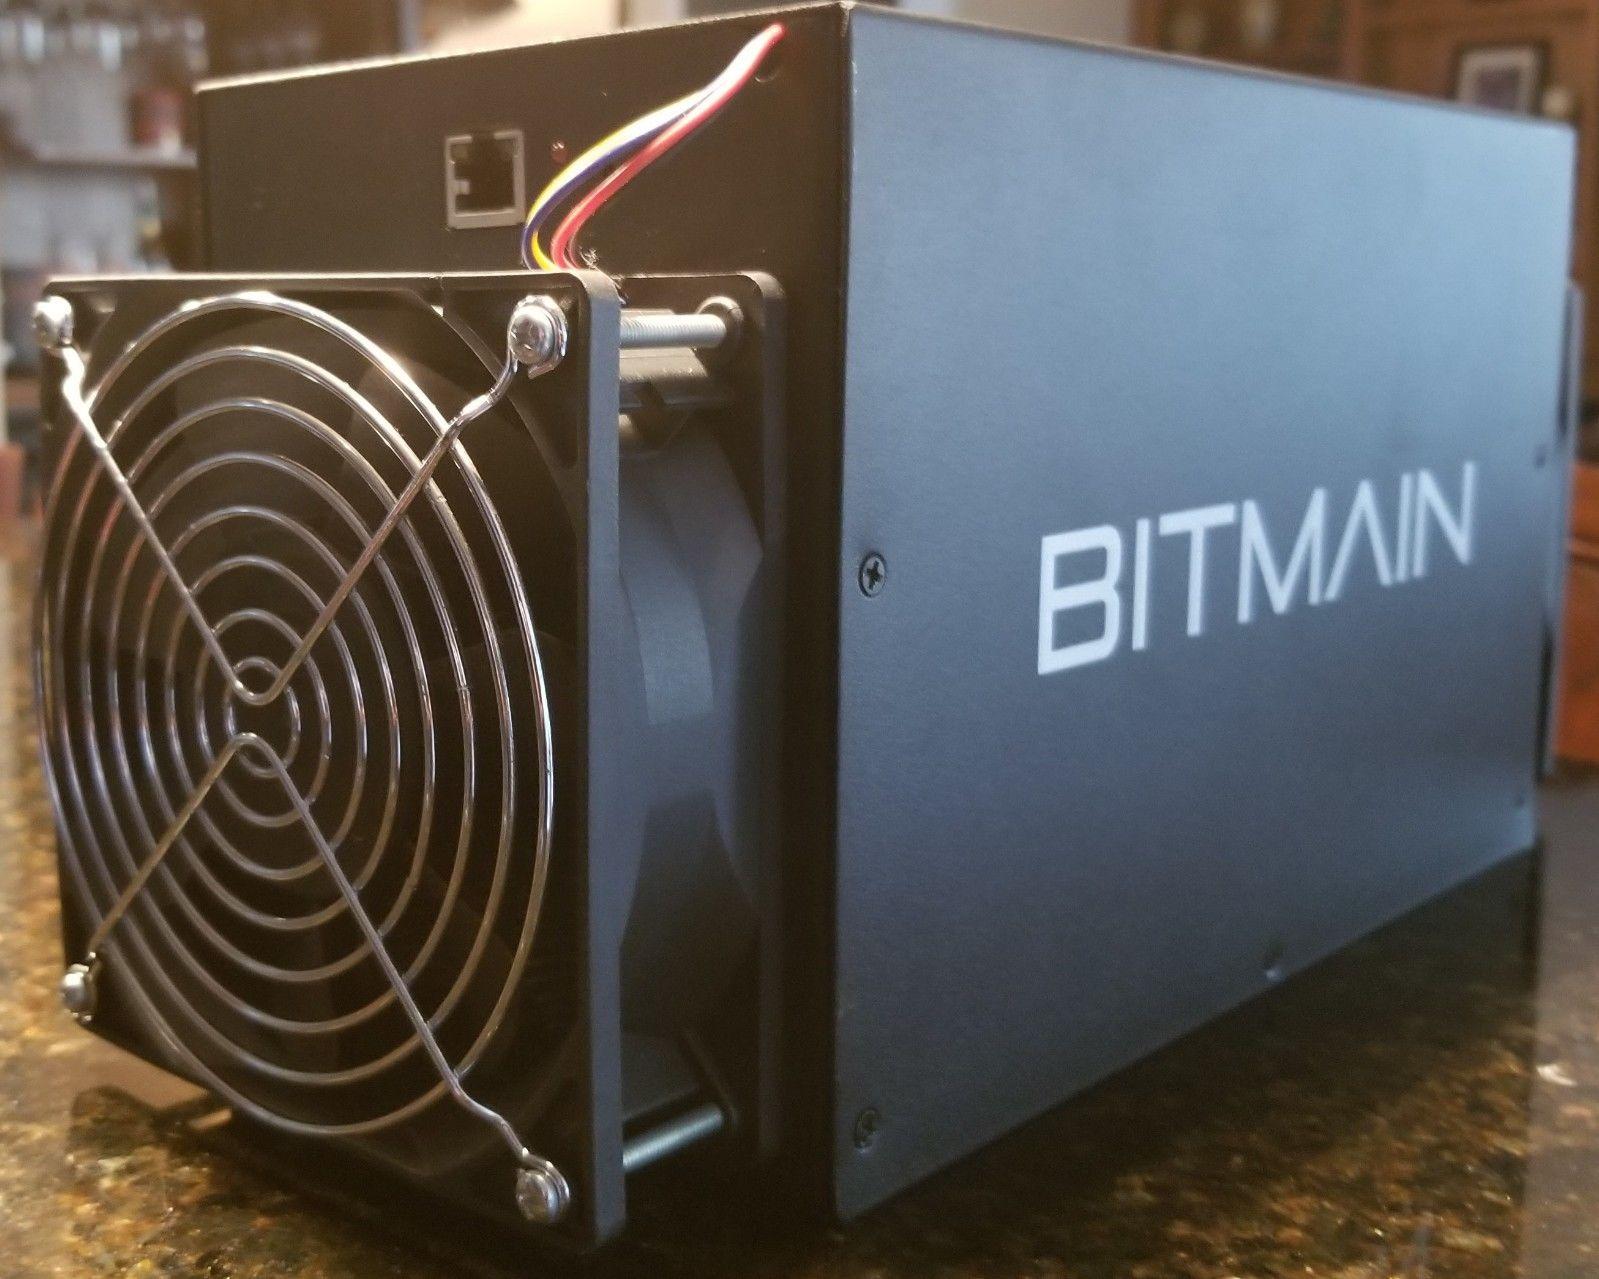 Antminer S3 Bitcoin miner - $350